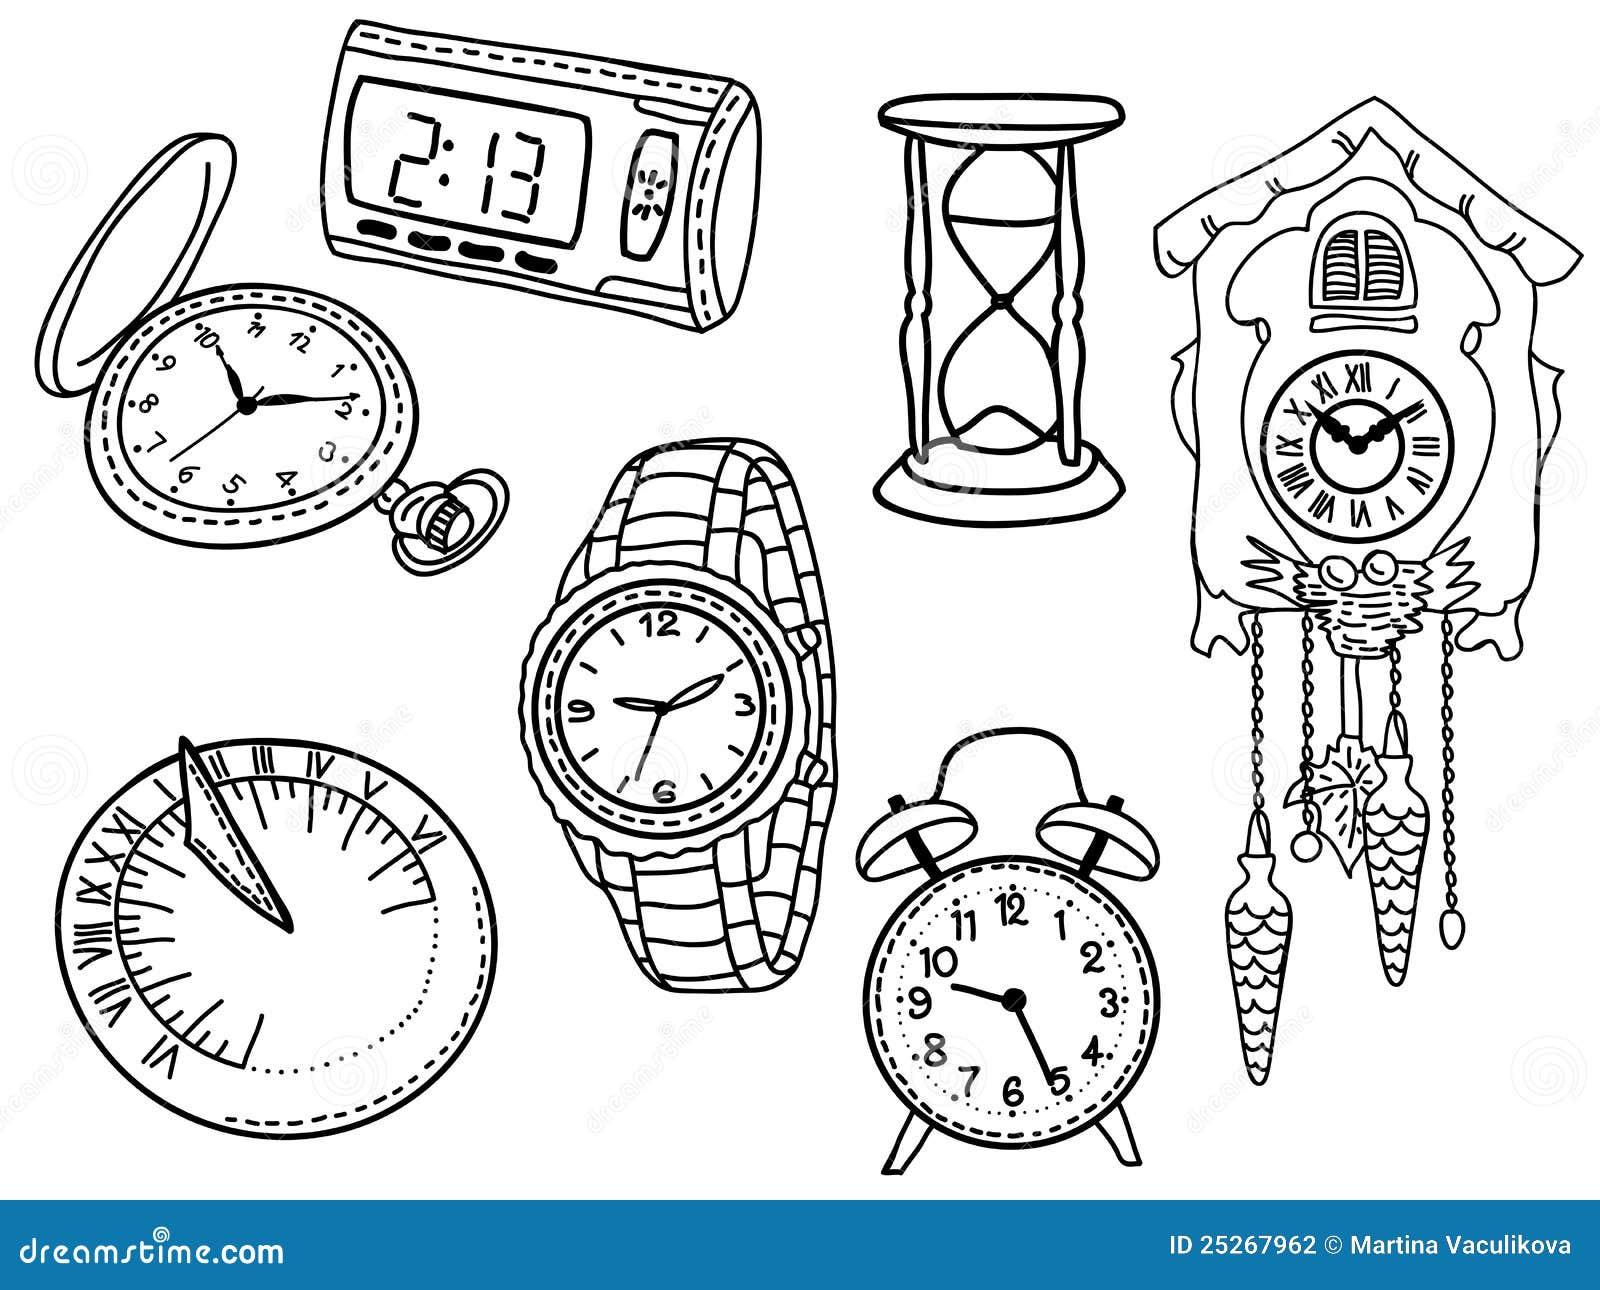 Armbanduhr gezeichnet  Set Borduhren Und Armbanduhren Stockfotografie - Bild: 25267962